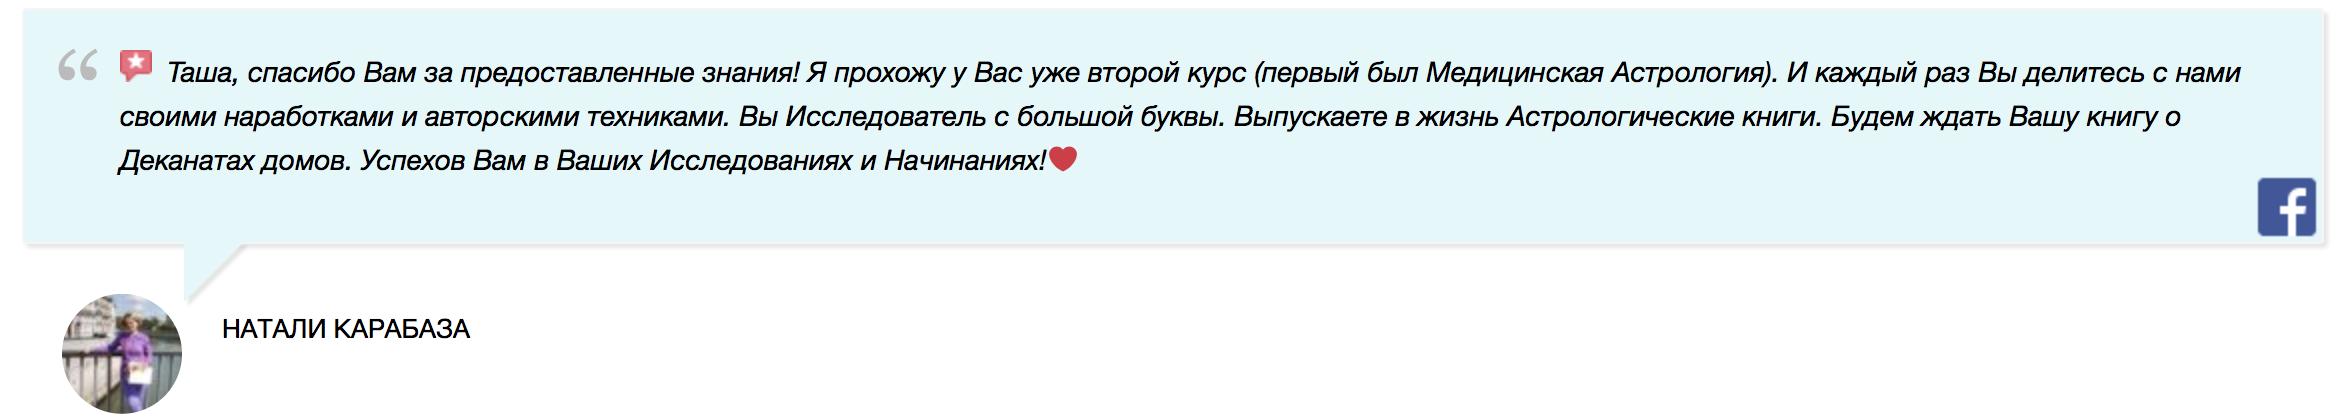 https://astrologtasha.ru/wp-content/uploads/2021/02/Screen-Shot-2021-02-09-at-11.34.54-AM.png